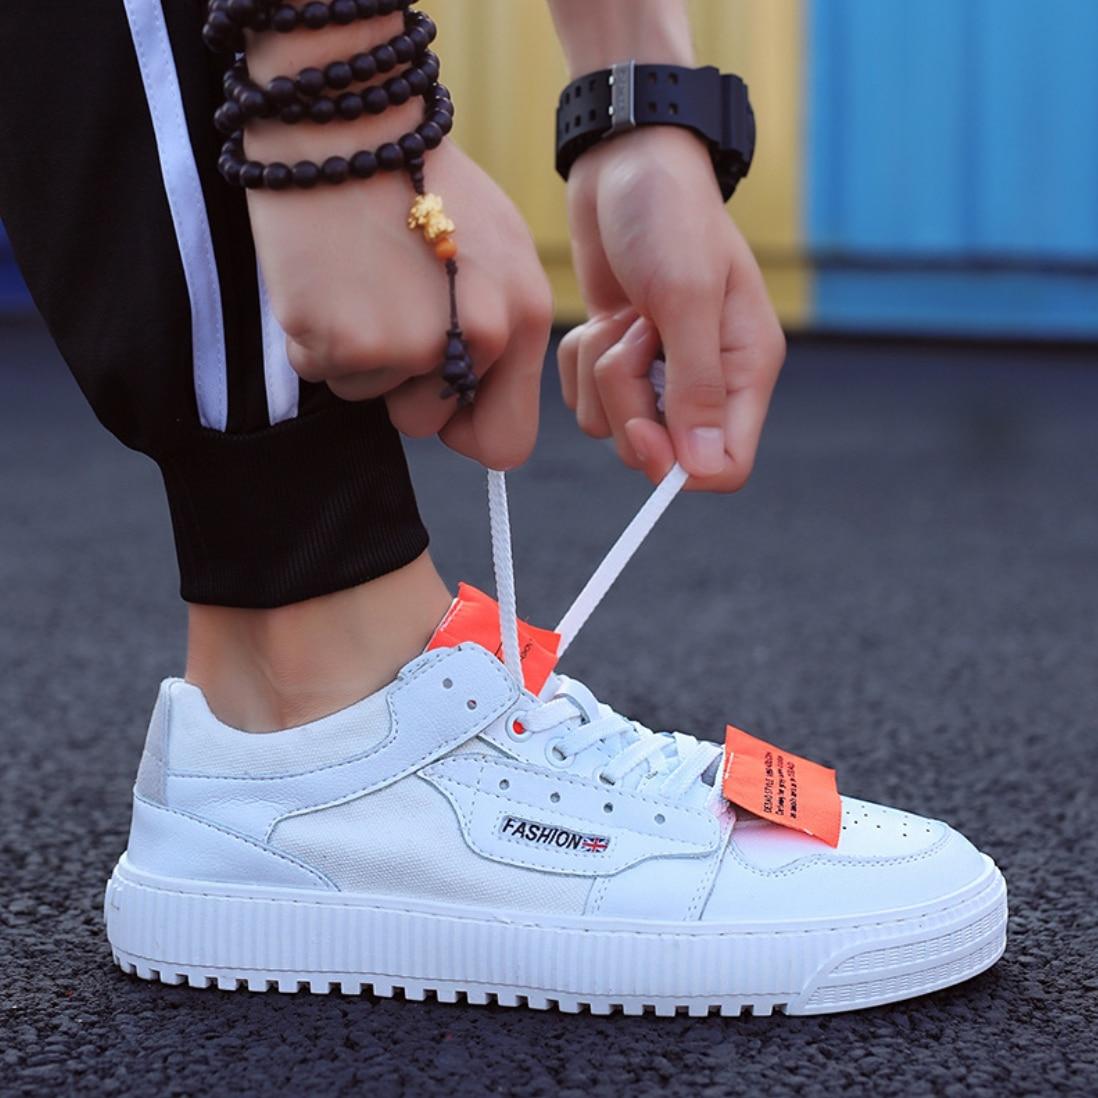 top Taille slip 44 Chaussures Designer Casual Beige Patchwork Dentelle Anti Hip Hop blanc Respirant Up Plat Hommes Marque Mâle kaki Sneakers Bas Toile 39 wqFXU4U